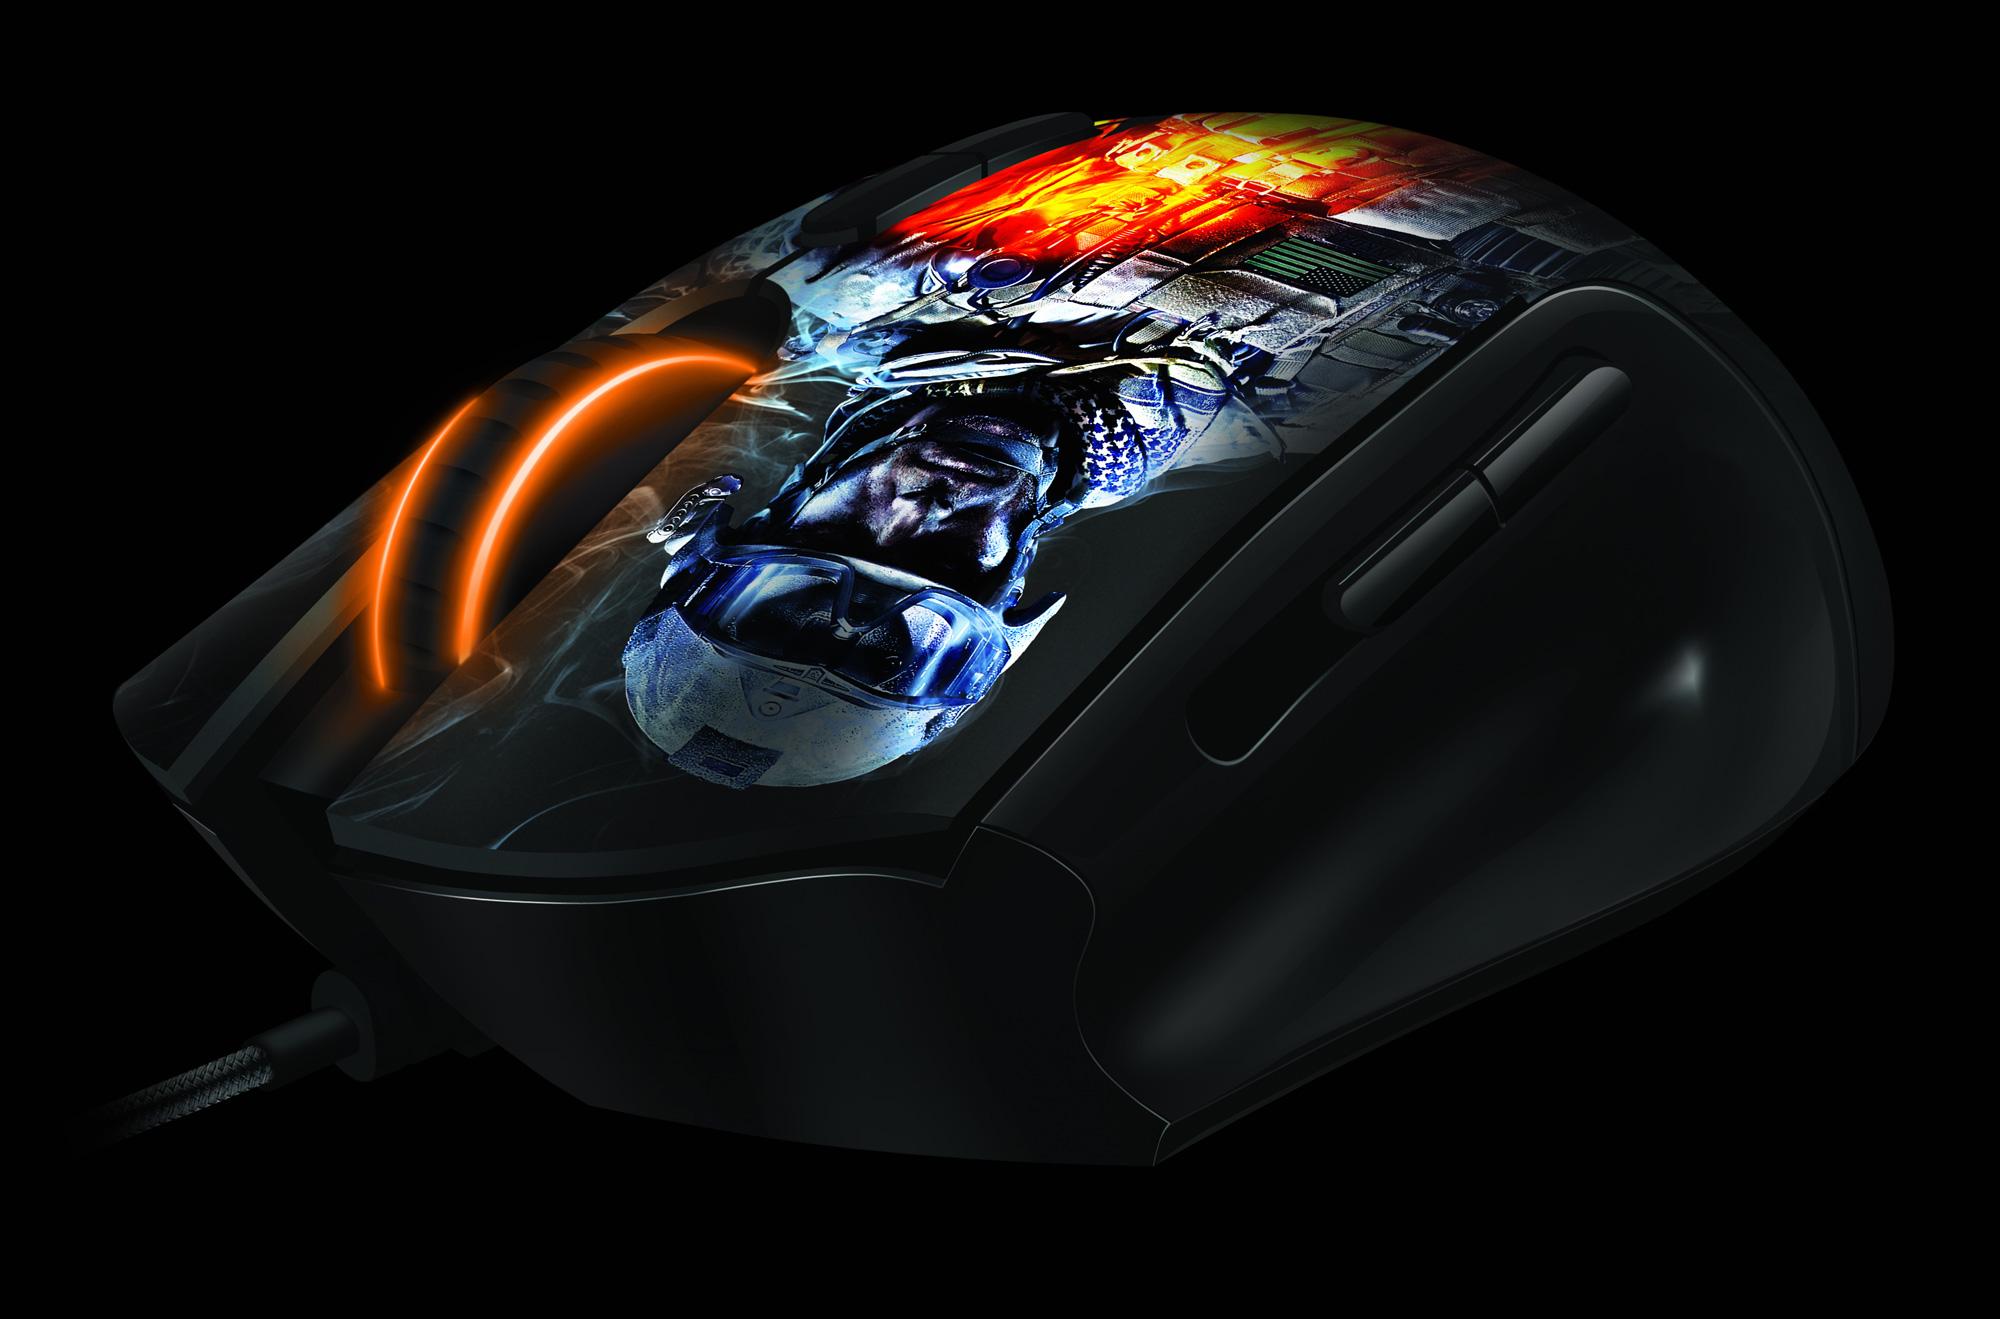 Deepcool Outs Gammaxx 200t Cpu Cooler Processor Battlefield 3 Imperator Mouse